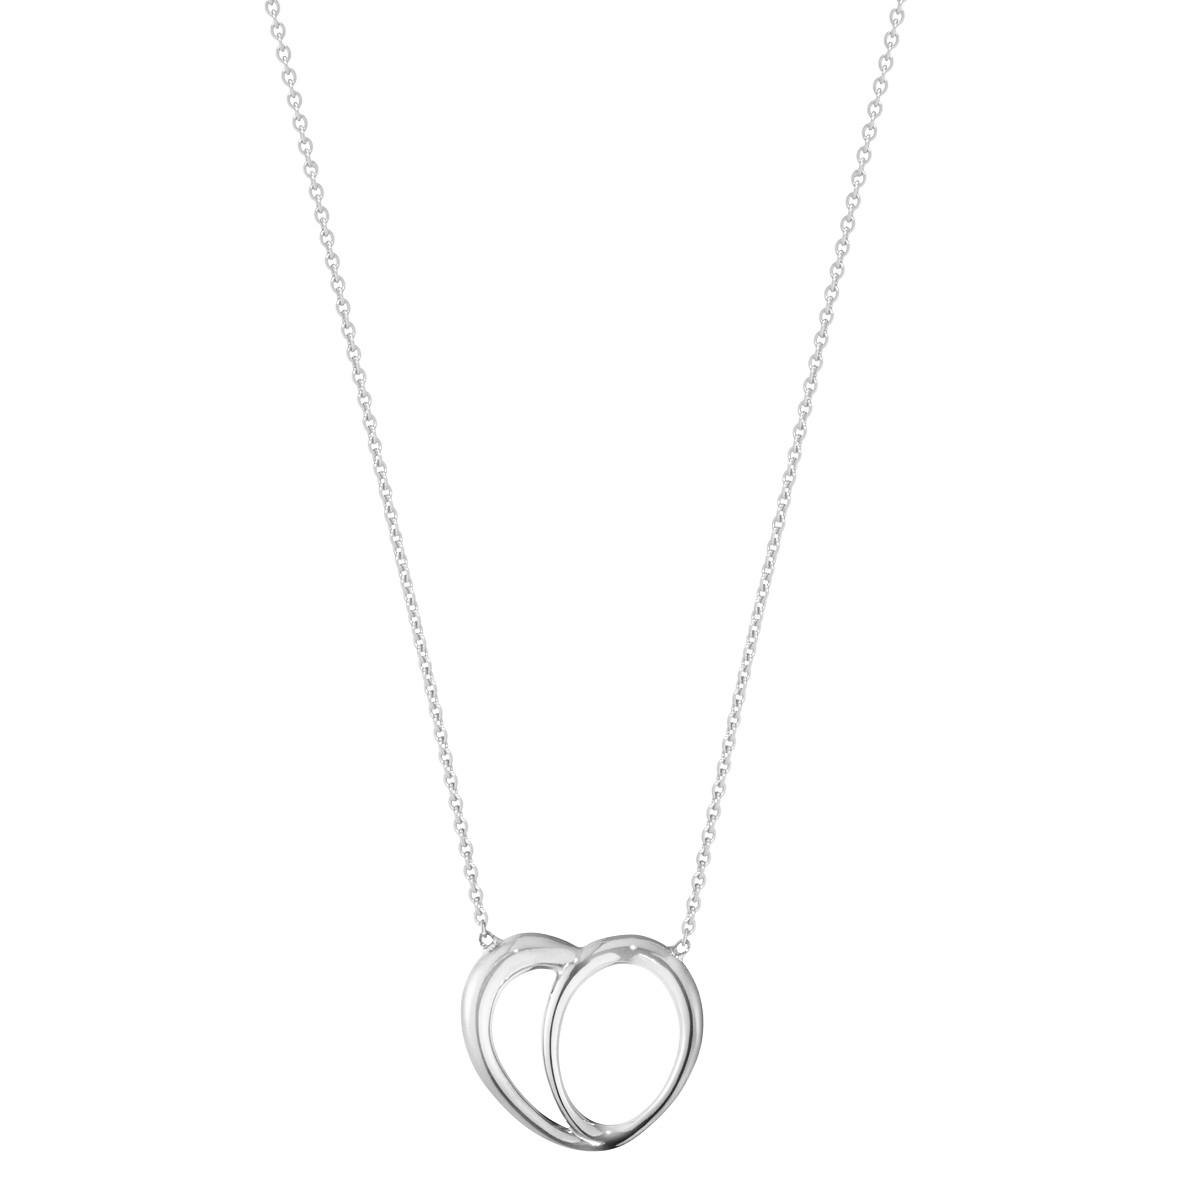 Georg Jensen Offspring Heart Necklace